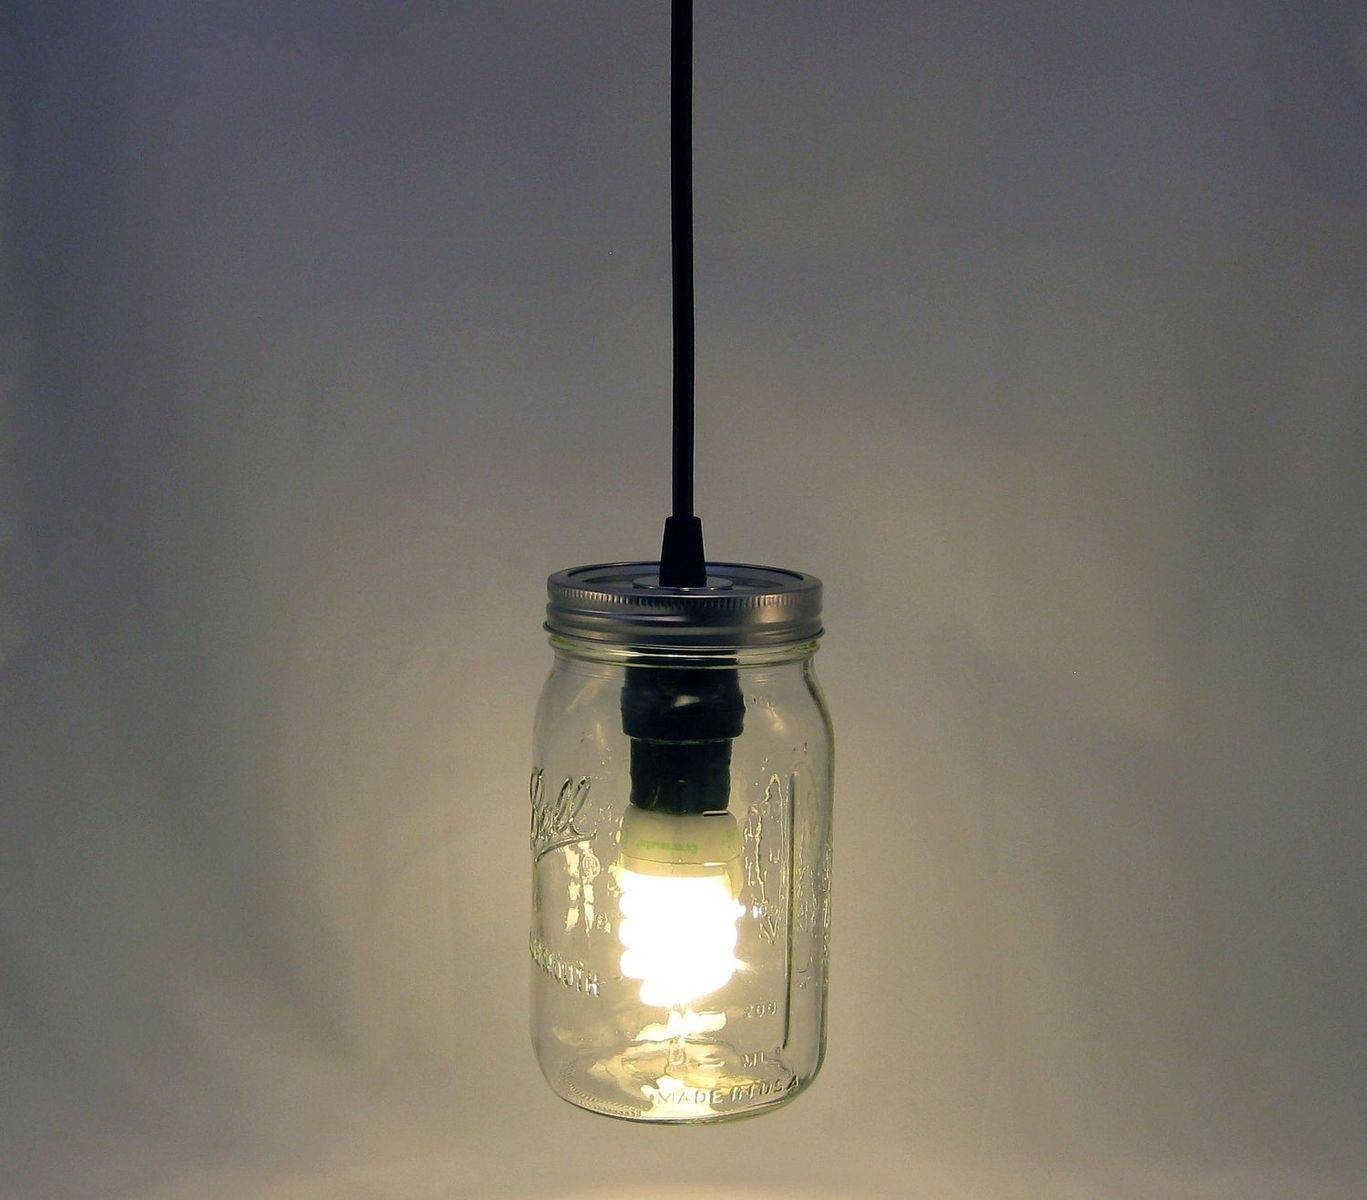 Custom Ball Mason Jar Hanging Pendant Light - Bmql-Svtmilton within Wine Jug Pendant Lights (Image 6 of 15)